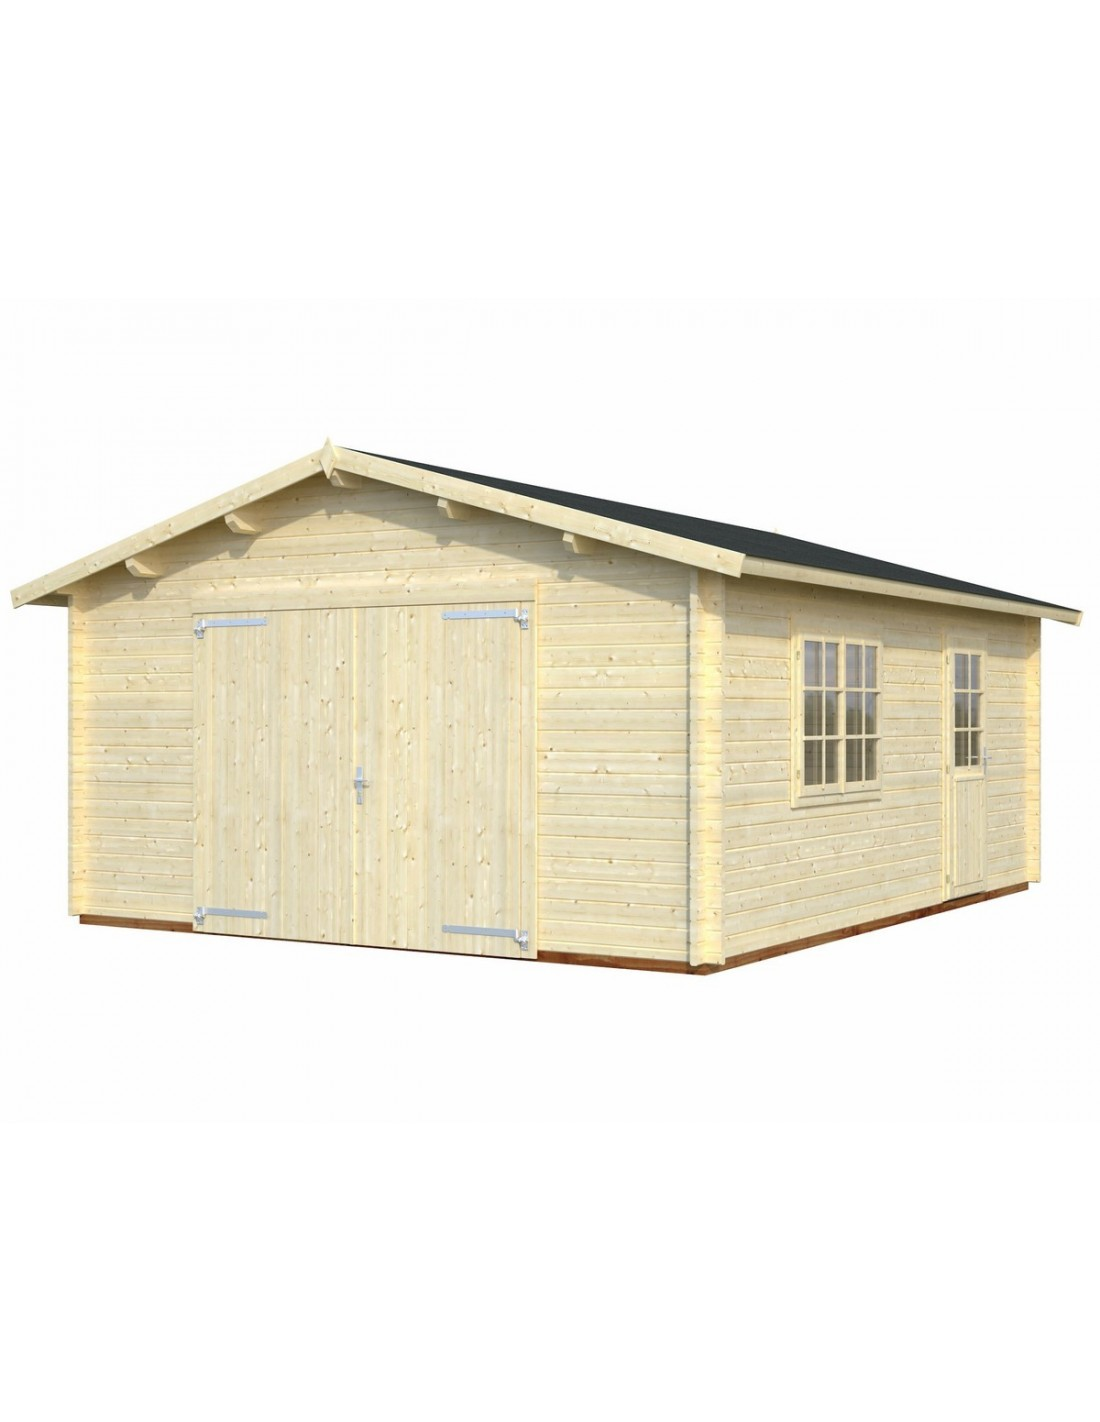 Garage roger 25 m au choix bois massif 44 mm - Garajes prefabricados precios ...